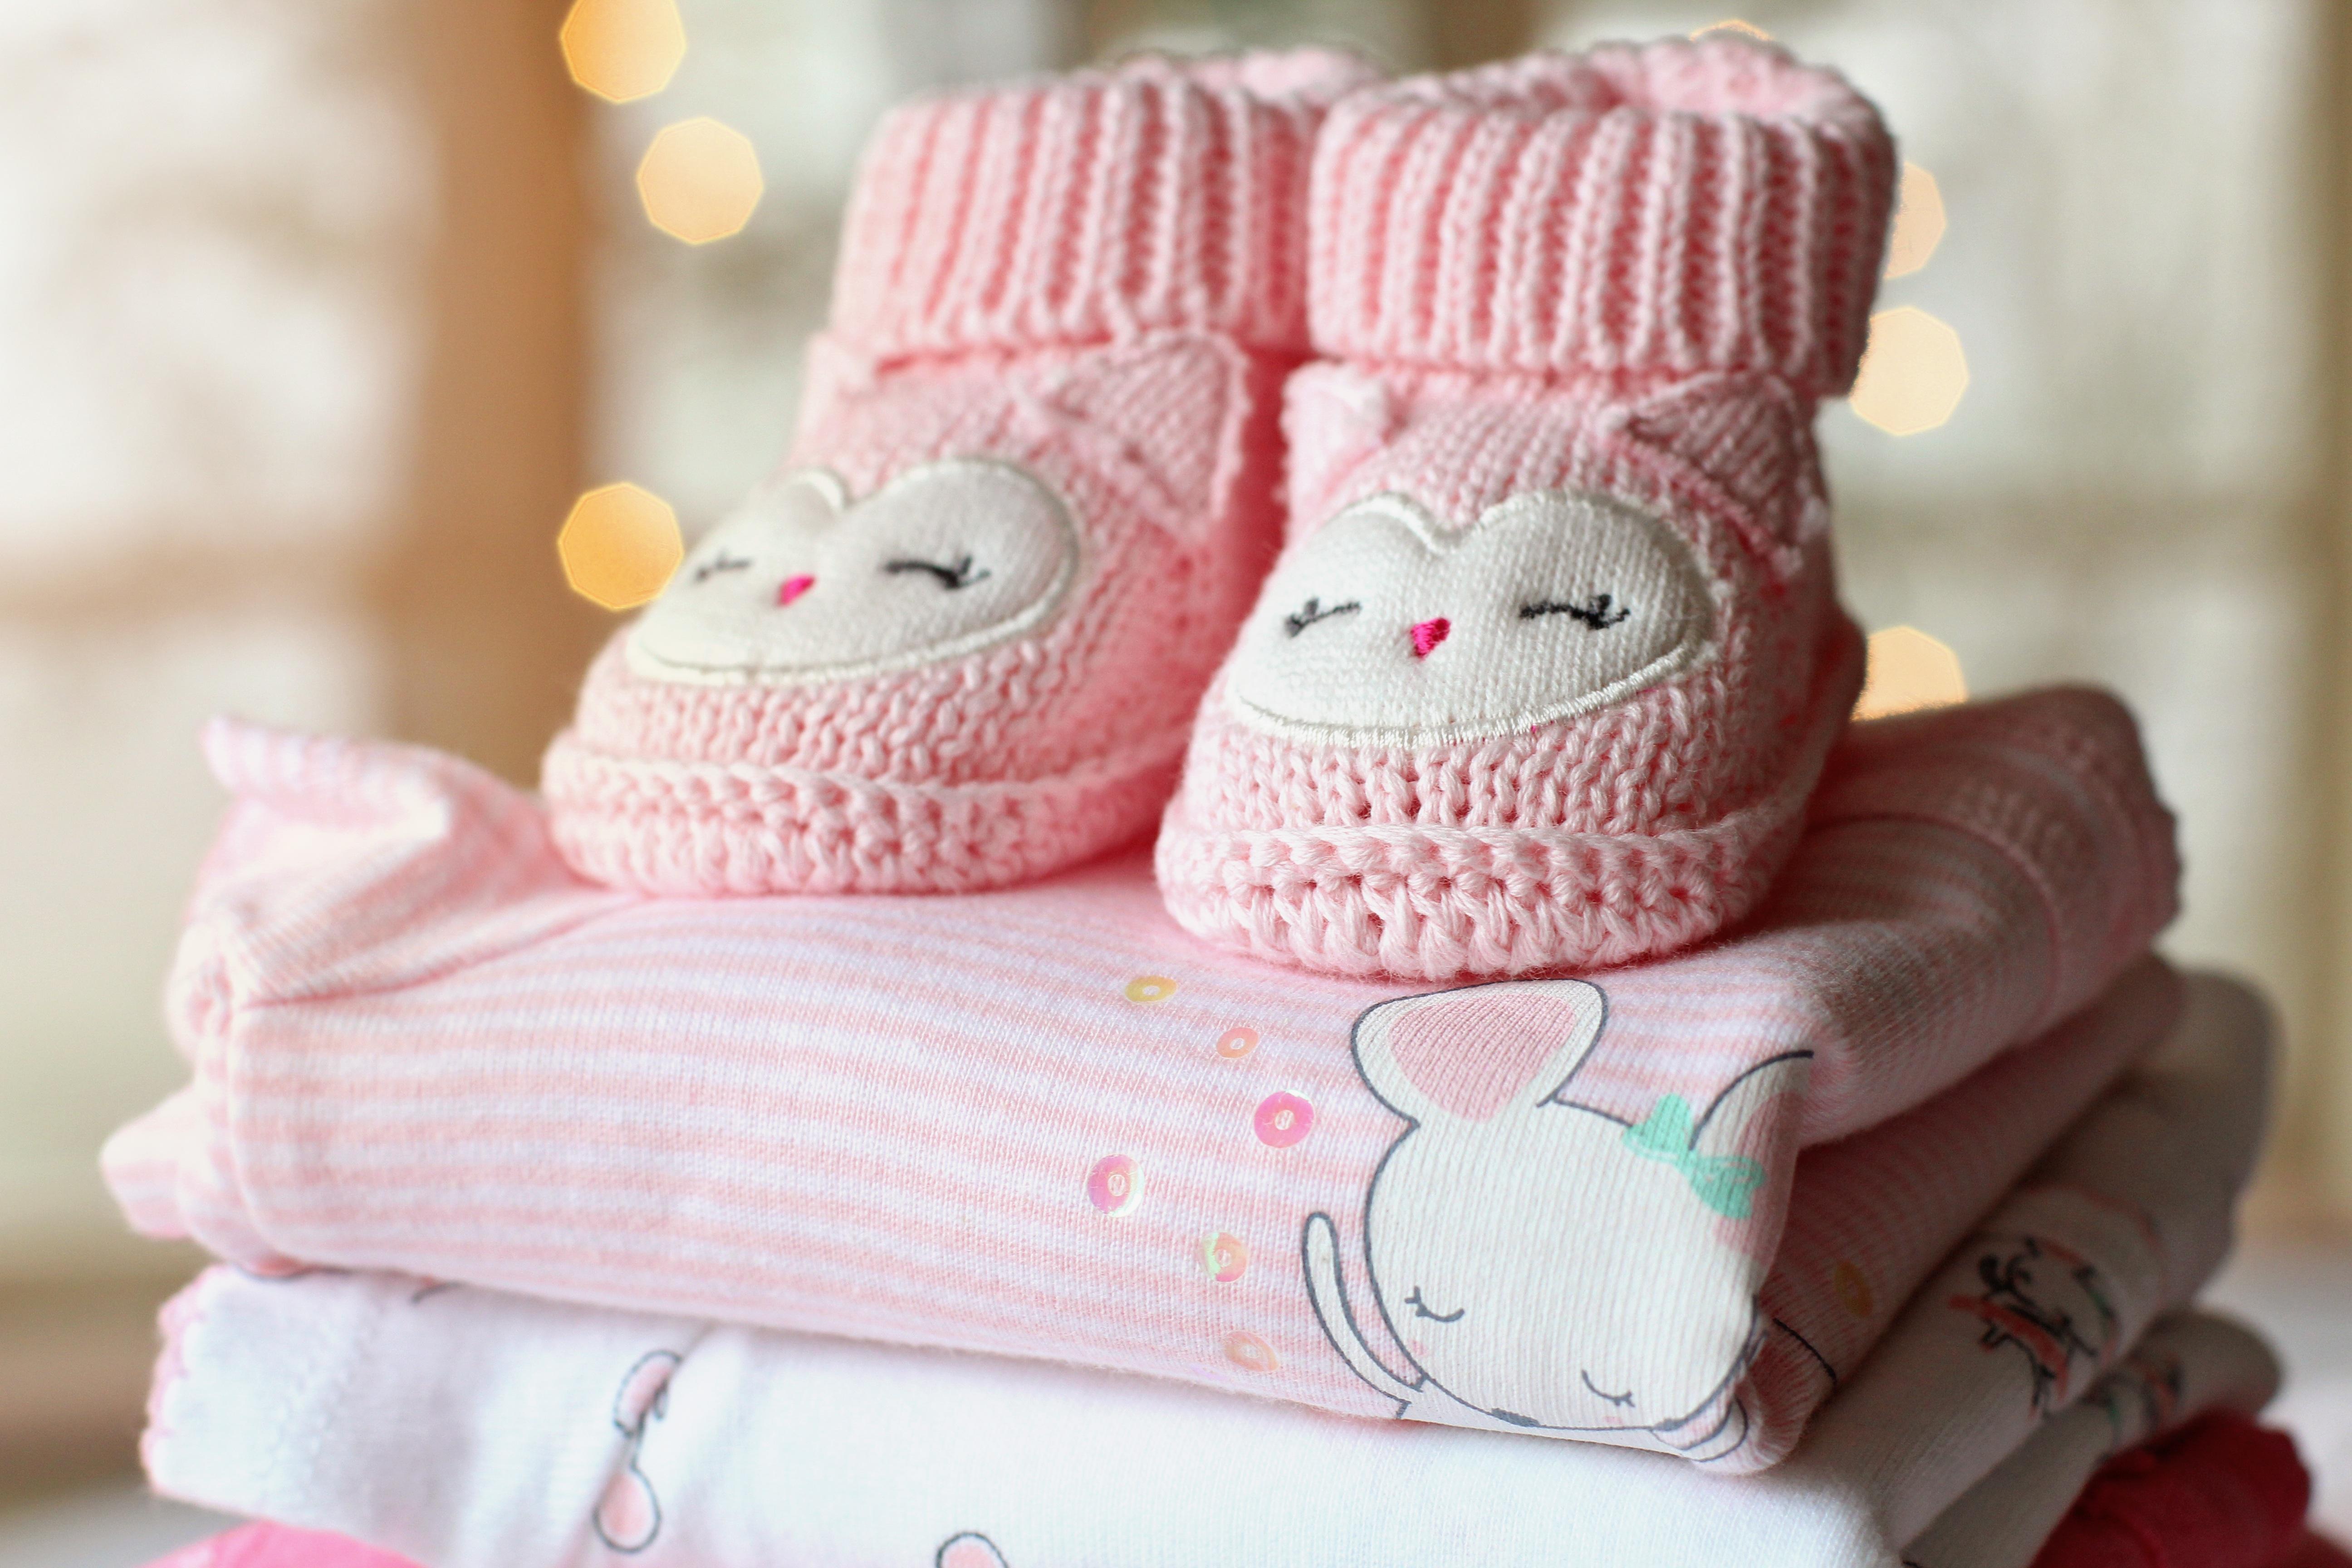 Fotos gratis : zapato, niña, blanco, dulce, niño, linda, hembra ...